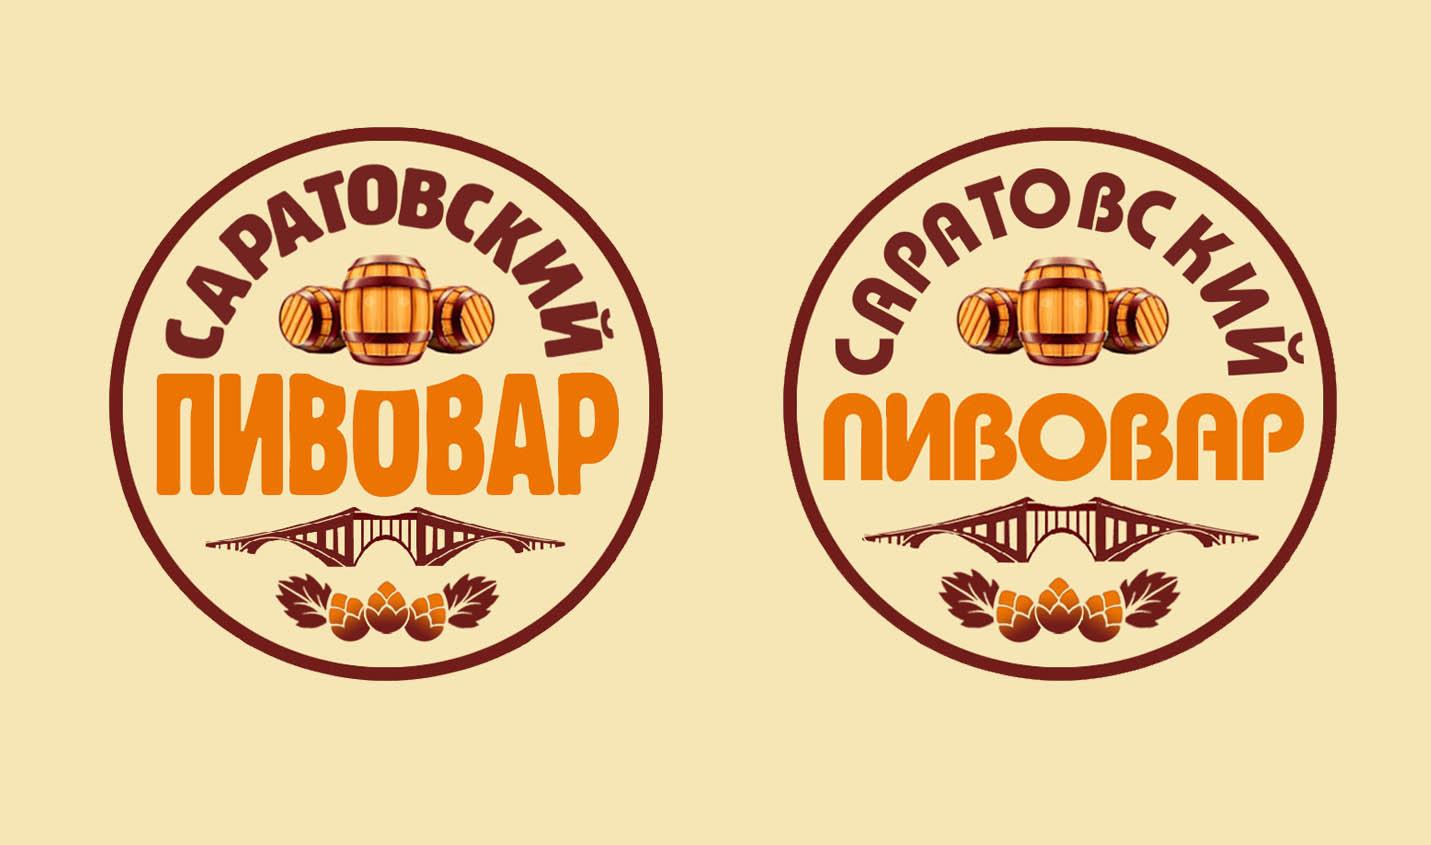 Разработка логотипа для частной пивоварни фото f_0655d7b583aa4391.jpg